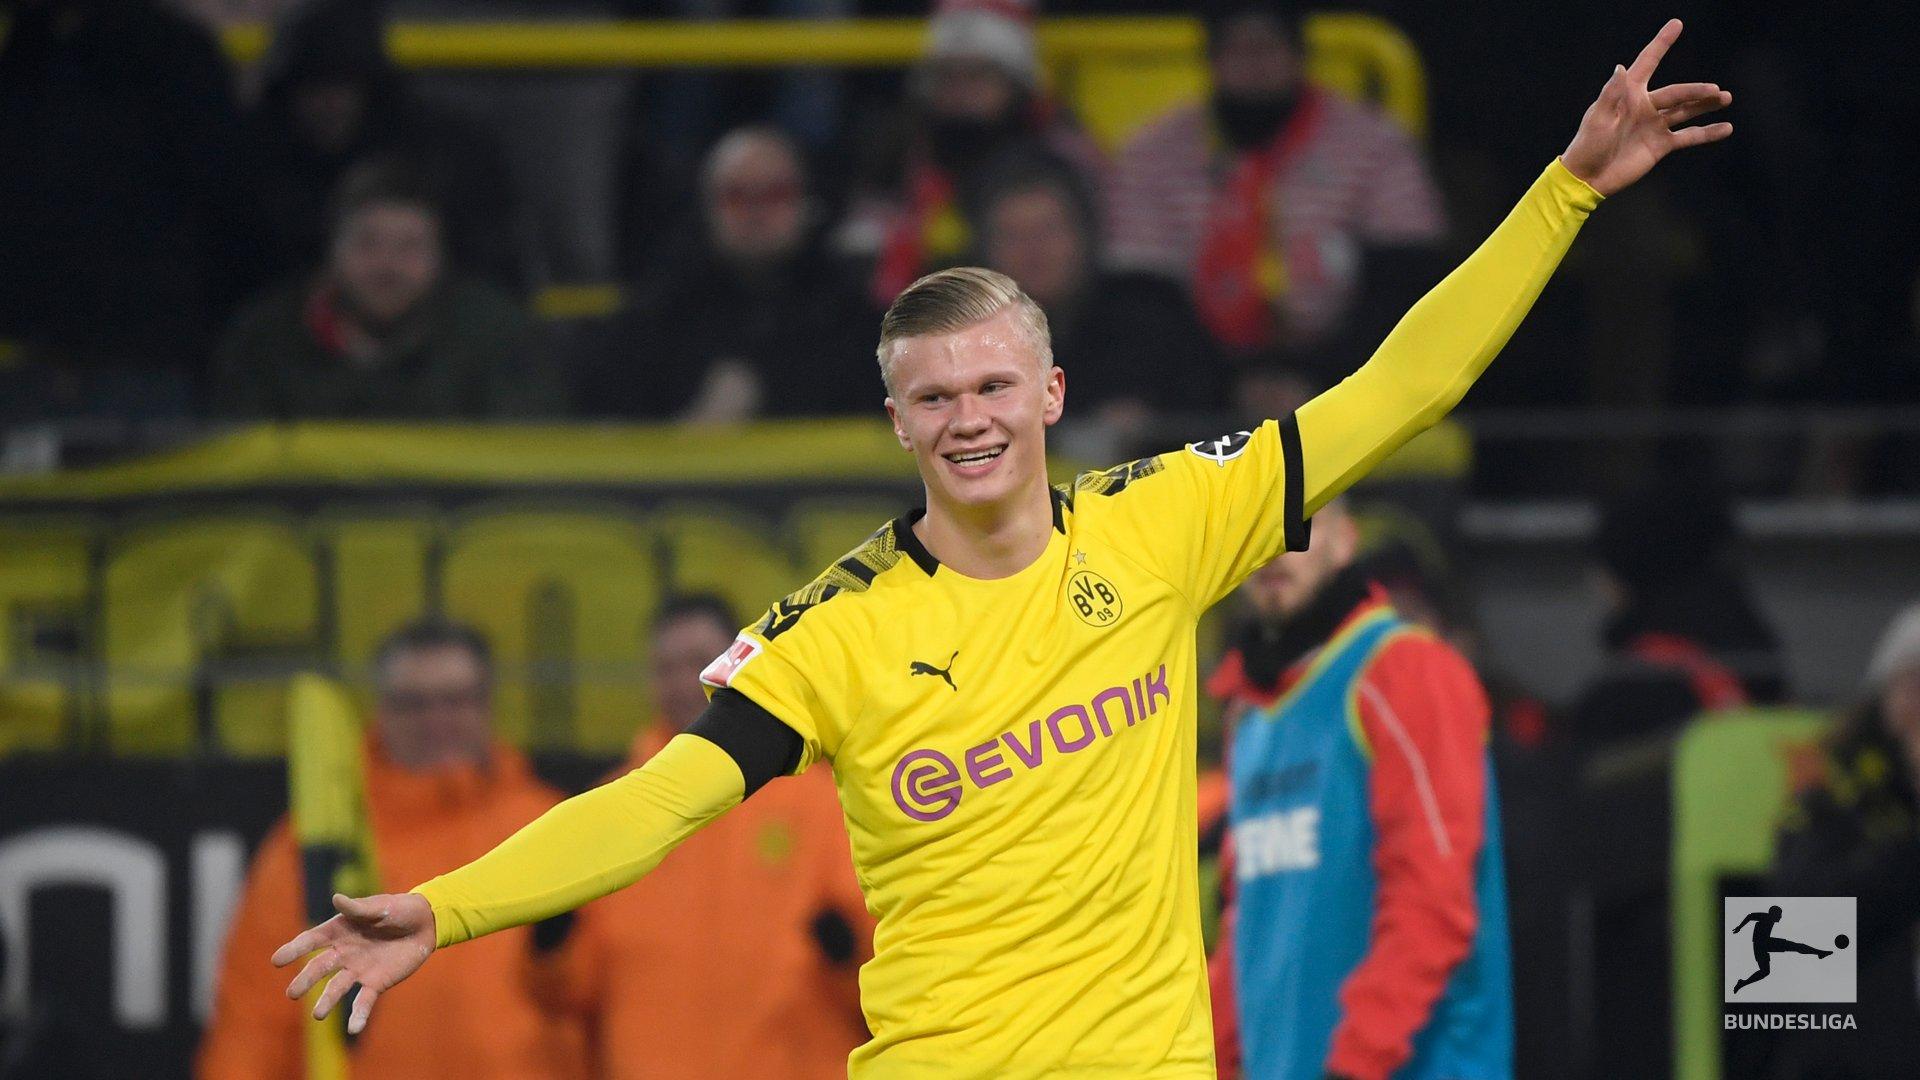 Bild: Raiola ha imposto una clausola rescissoria di 75 milioni al Borussia per Haaland